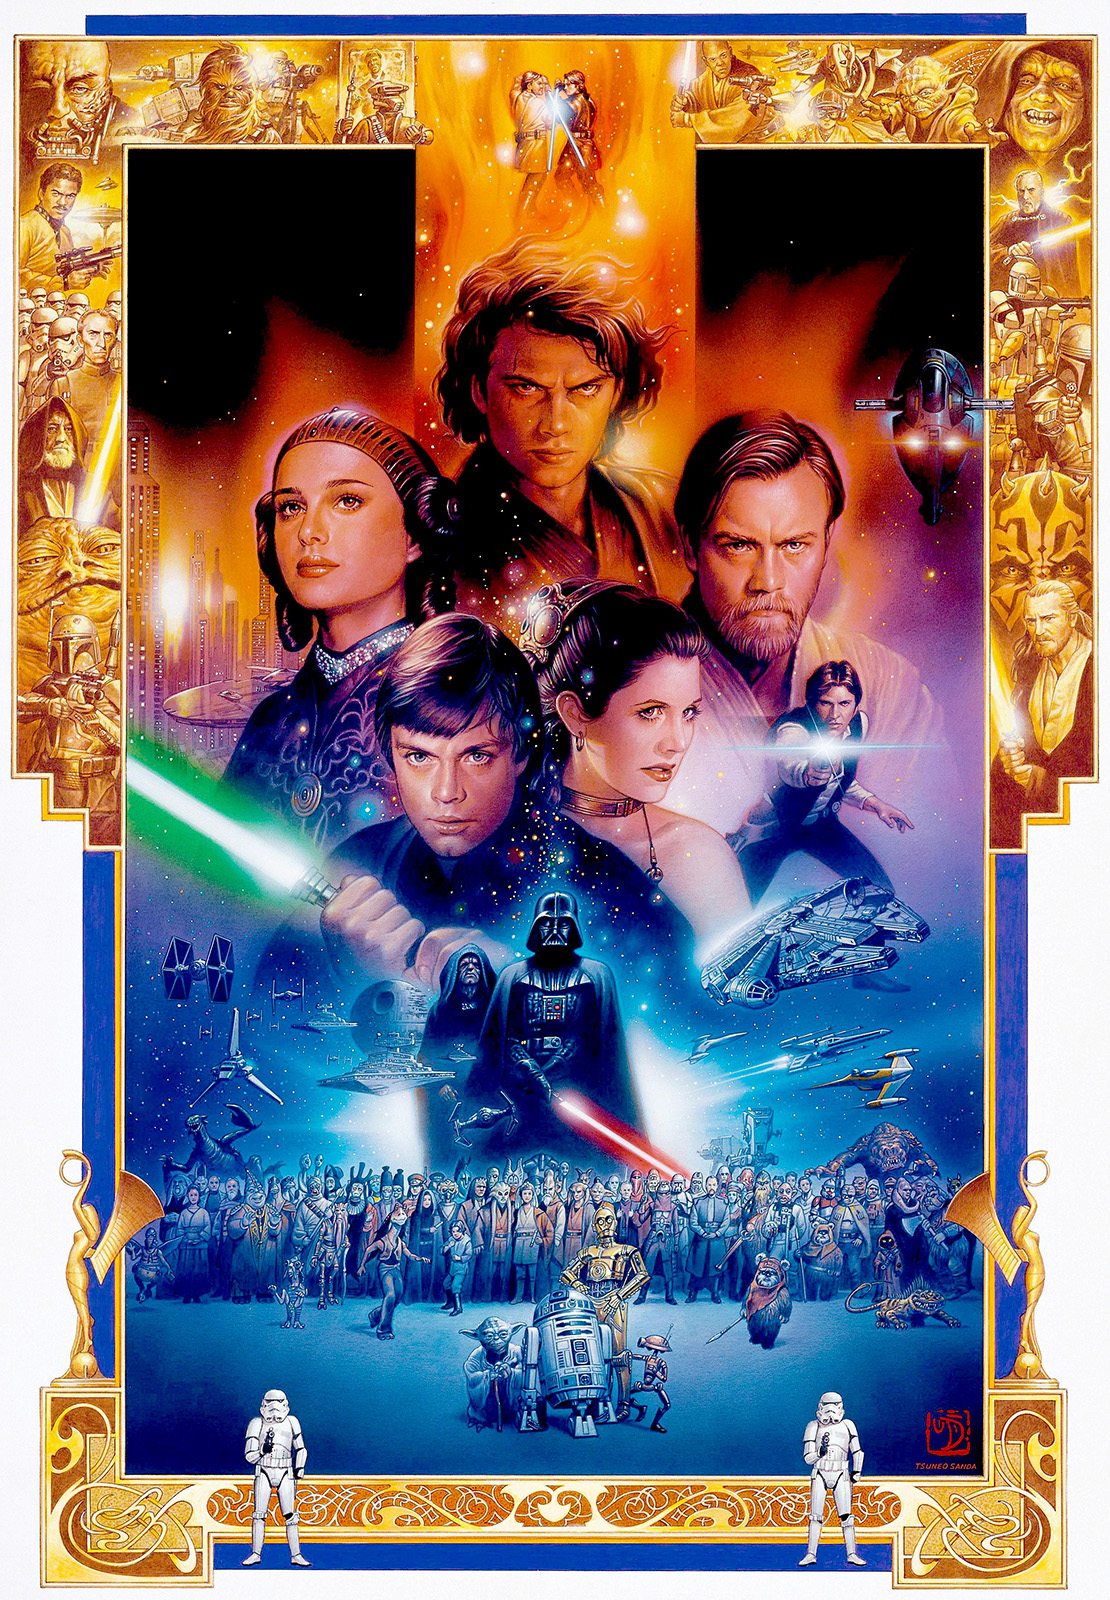 the geeky nerfherder artoftheday 'star wars saga'